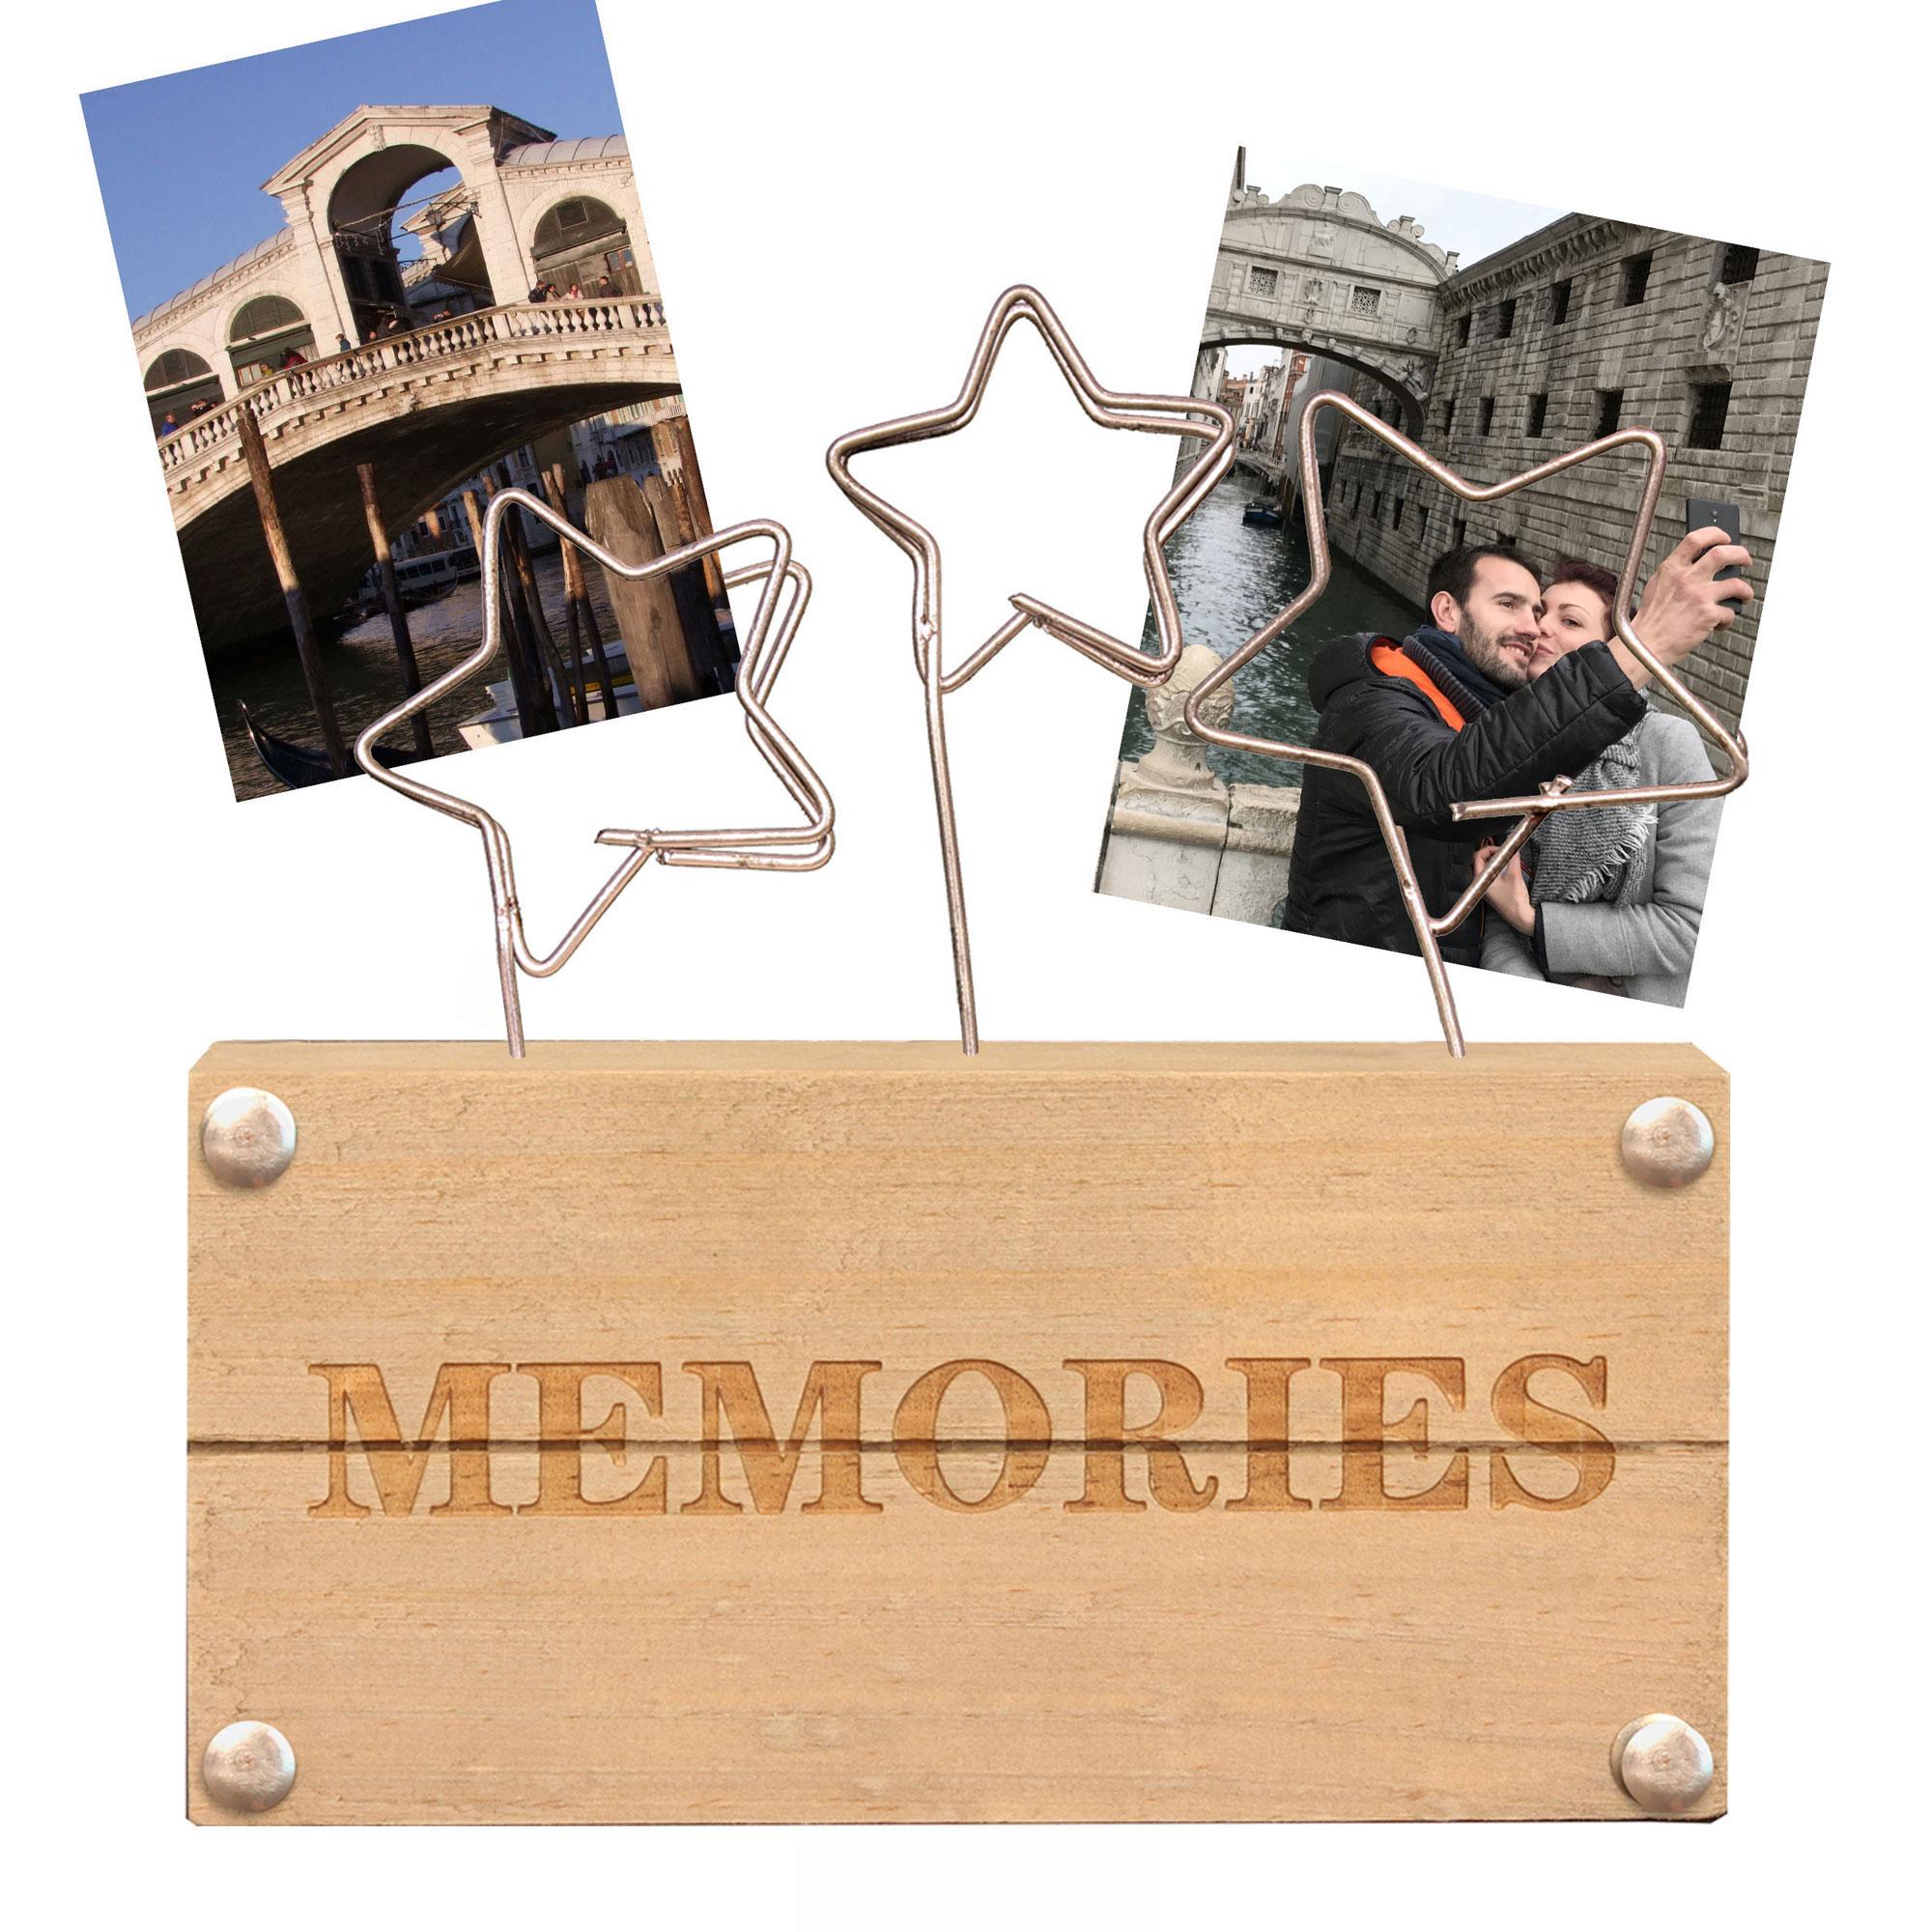 Collage Fotohalter - Memories Fotohalter - kleine-Rahmen - 15,5x16